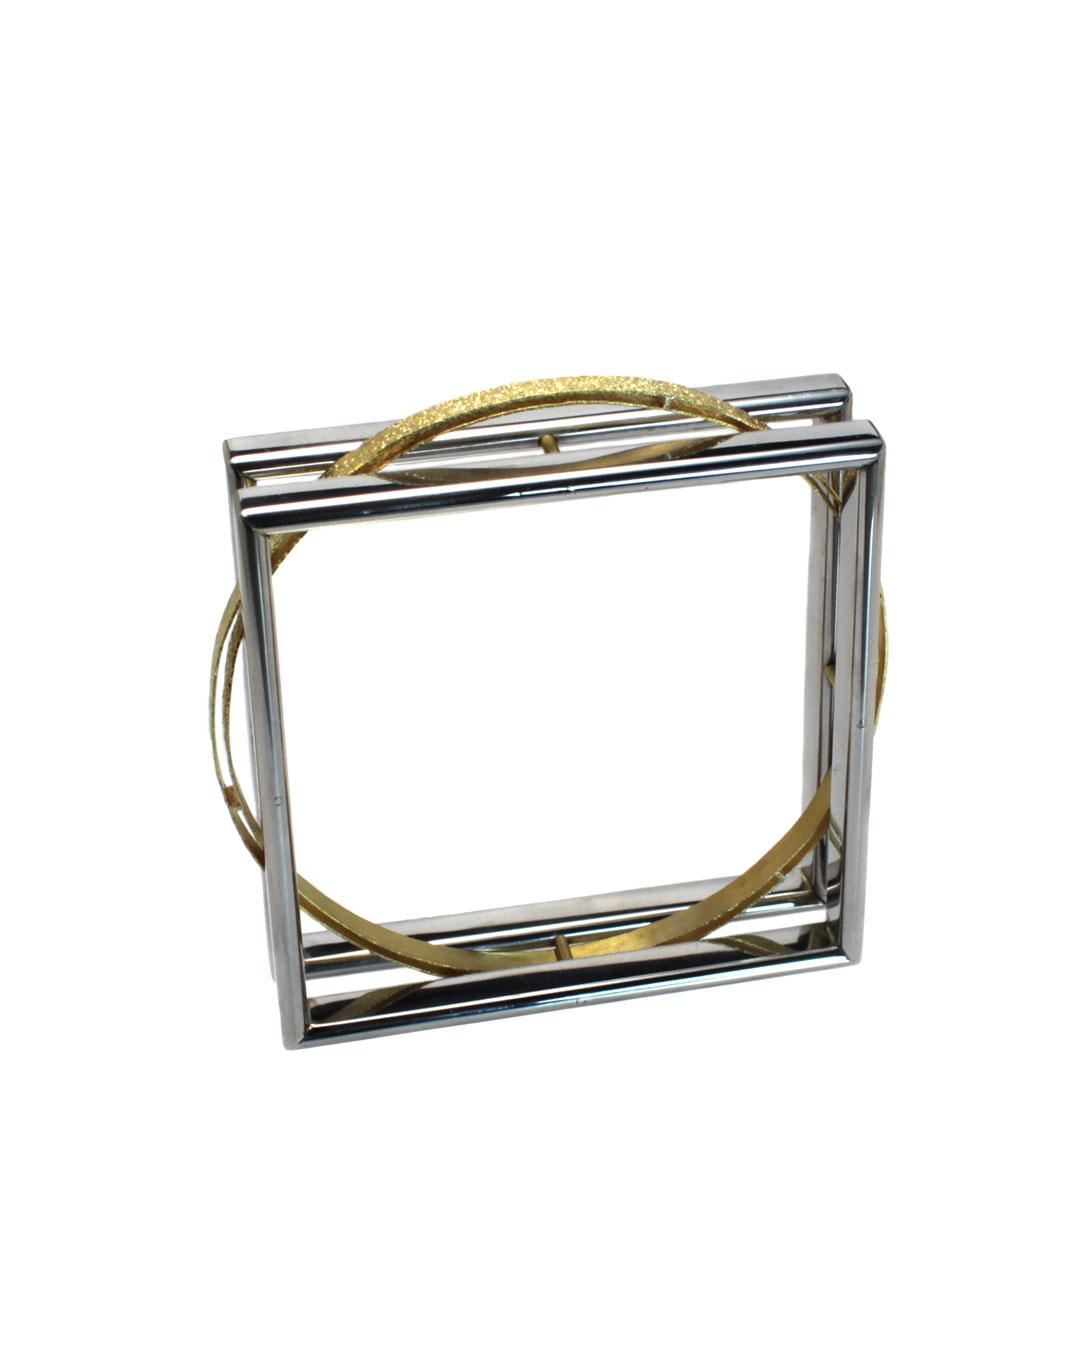 Okinari Kurokawa, untitled, 2014, bracelet, 20ct gold, stainless steel, 76 x 76 x 20 mm